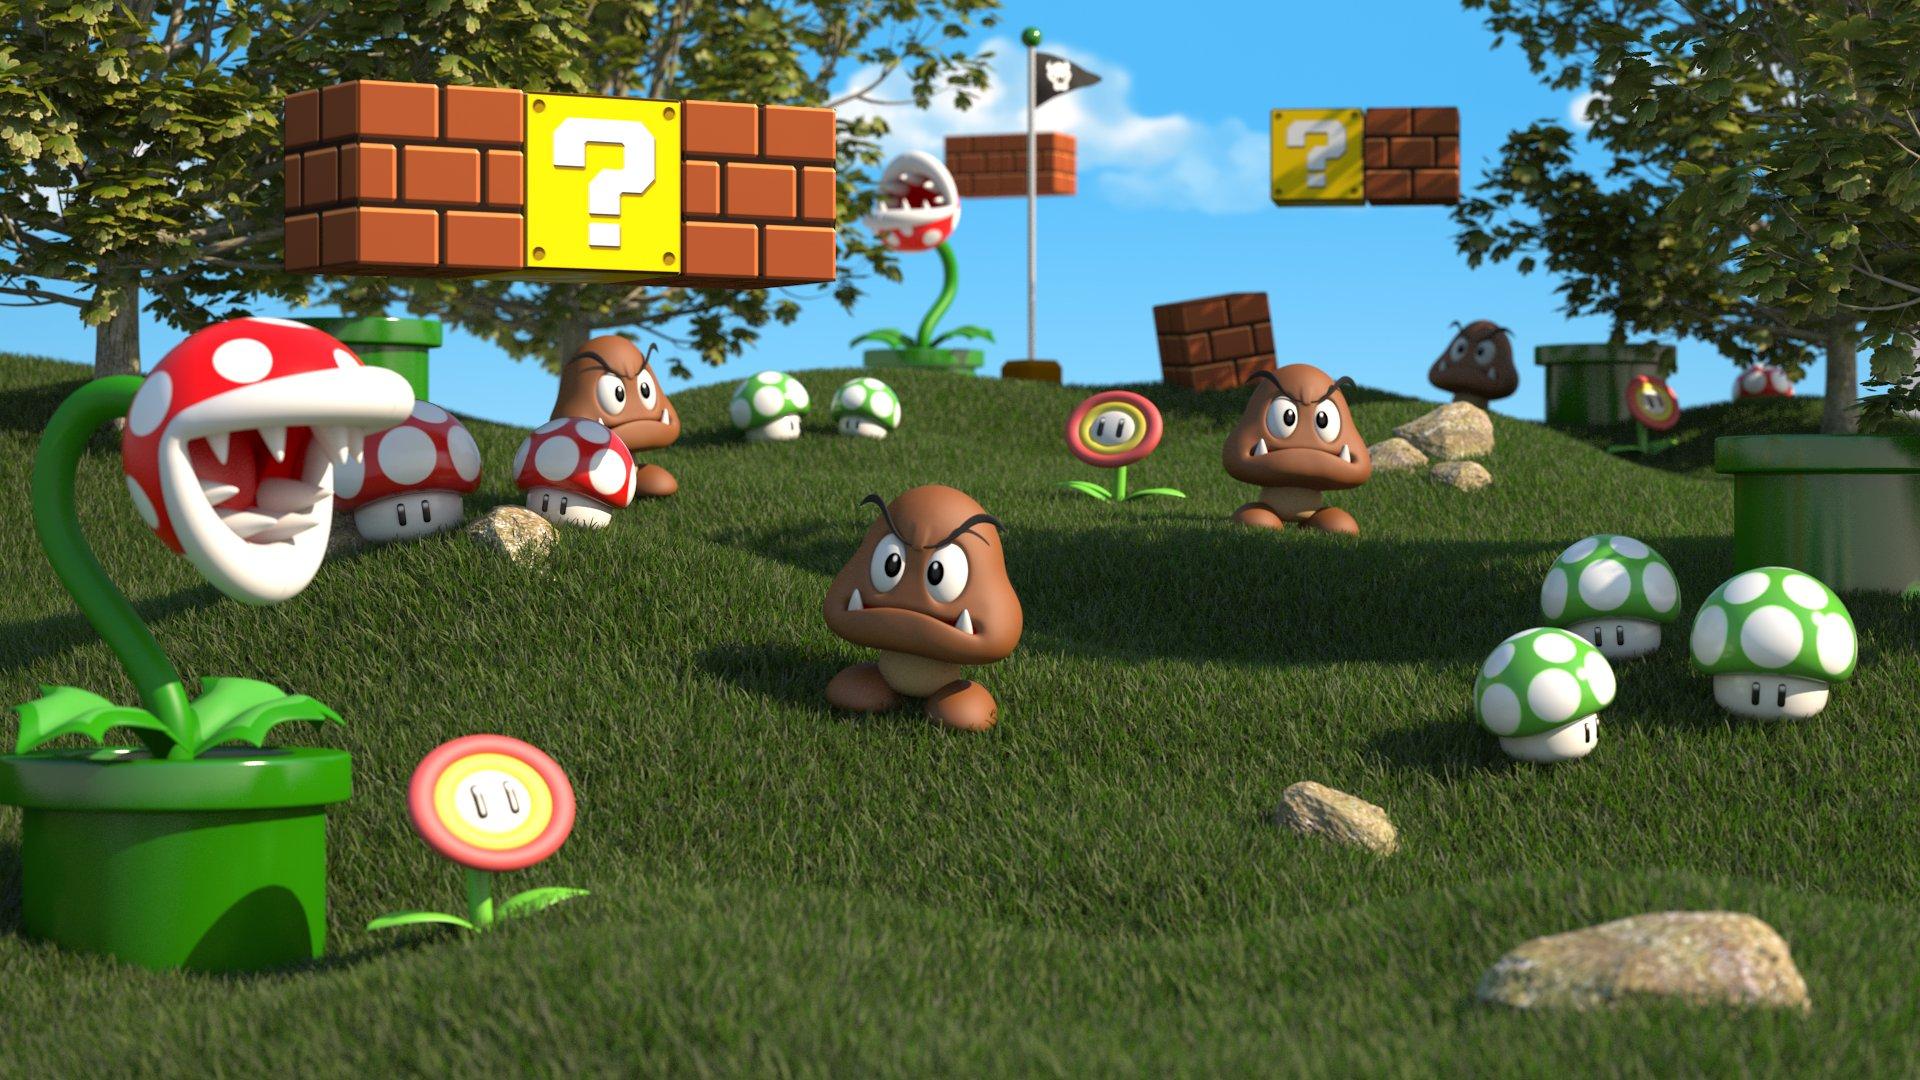 Free Download Video Game Super Mario 3d Land Wallpaper 1920x1080